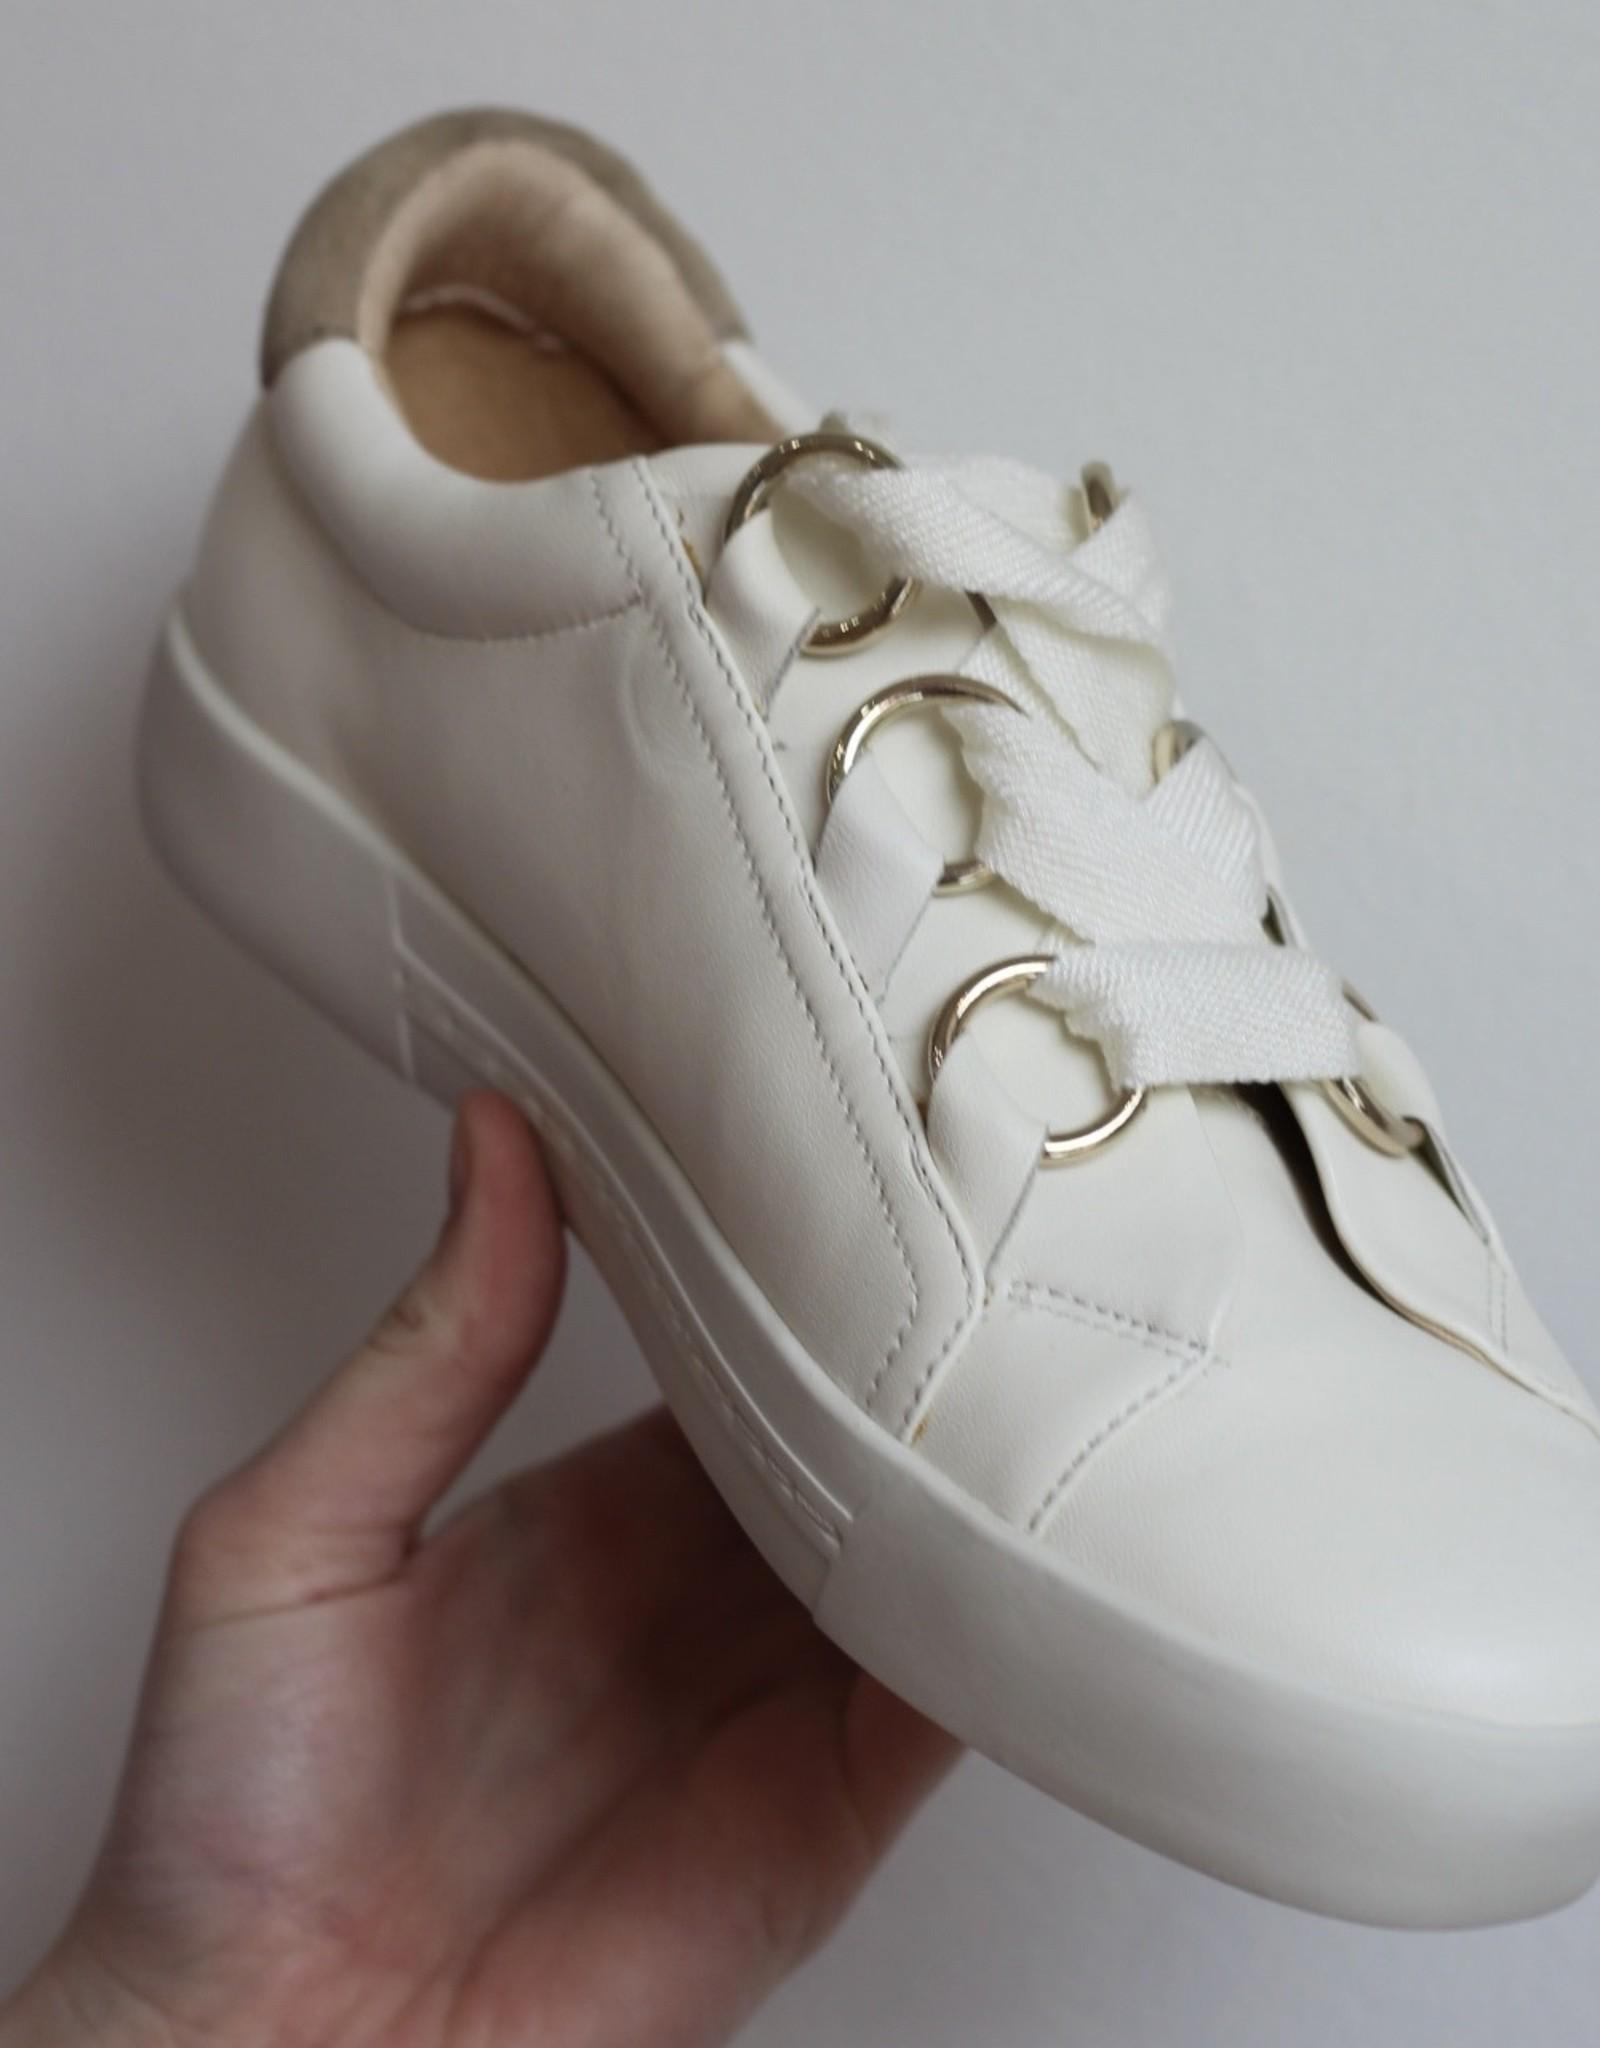 Joie Shoes Danby White Sneaker